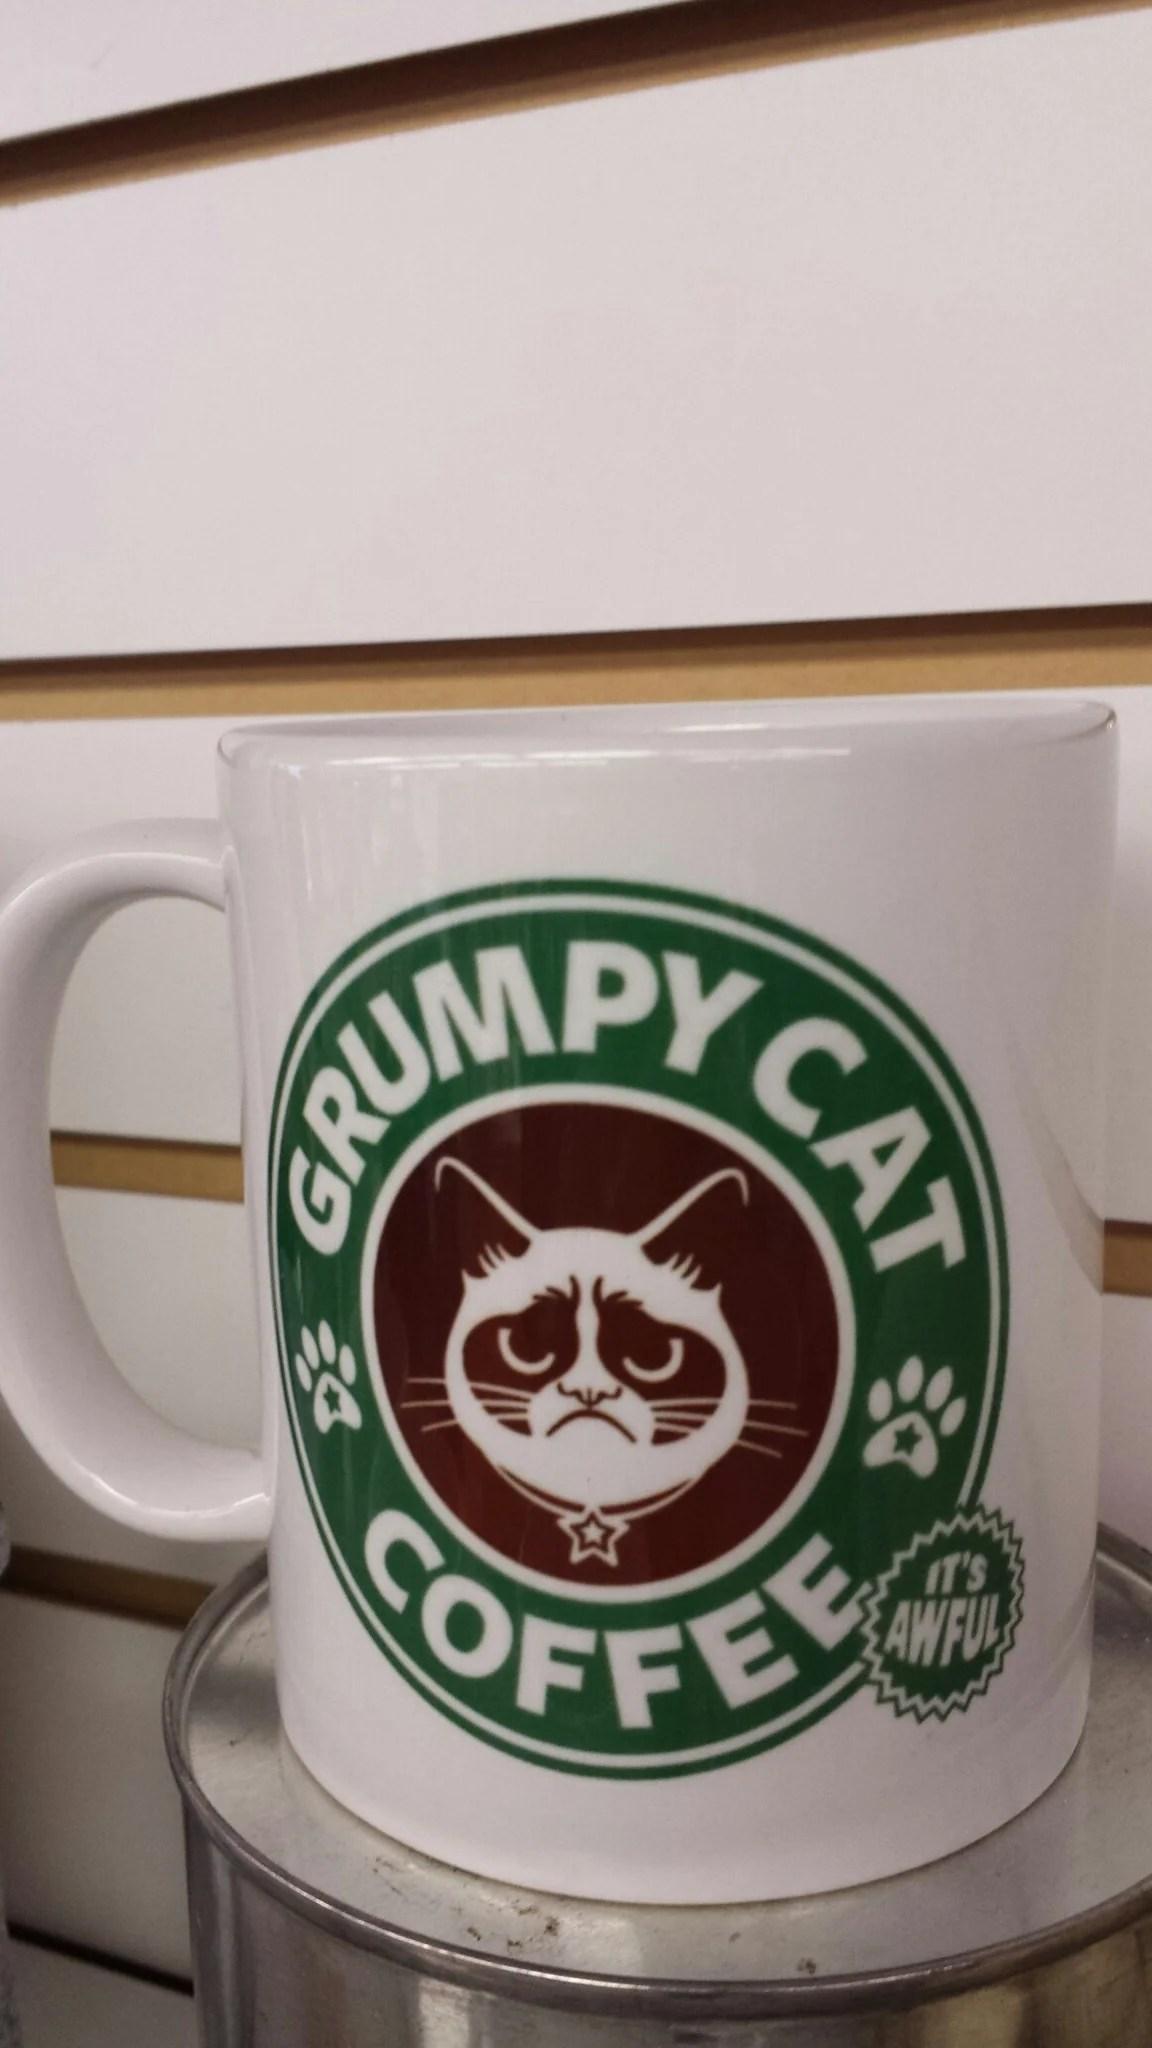 Amusing Grumpy Cat Starbucks Coffee Mug Grumpy Cat Starbucks Coffee Mug Junkyard Starbucks Coffee Mugs Seattle Starbucks Coffee Mugs Amazon nice food Starbucks Coffee Mugs